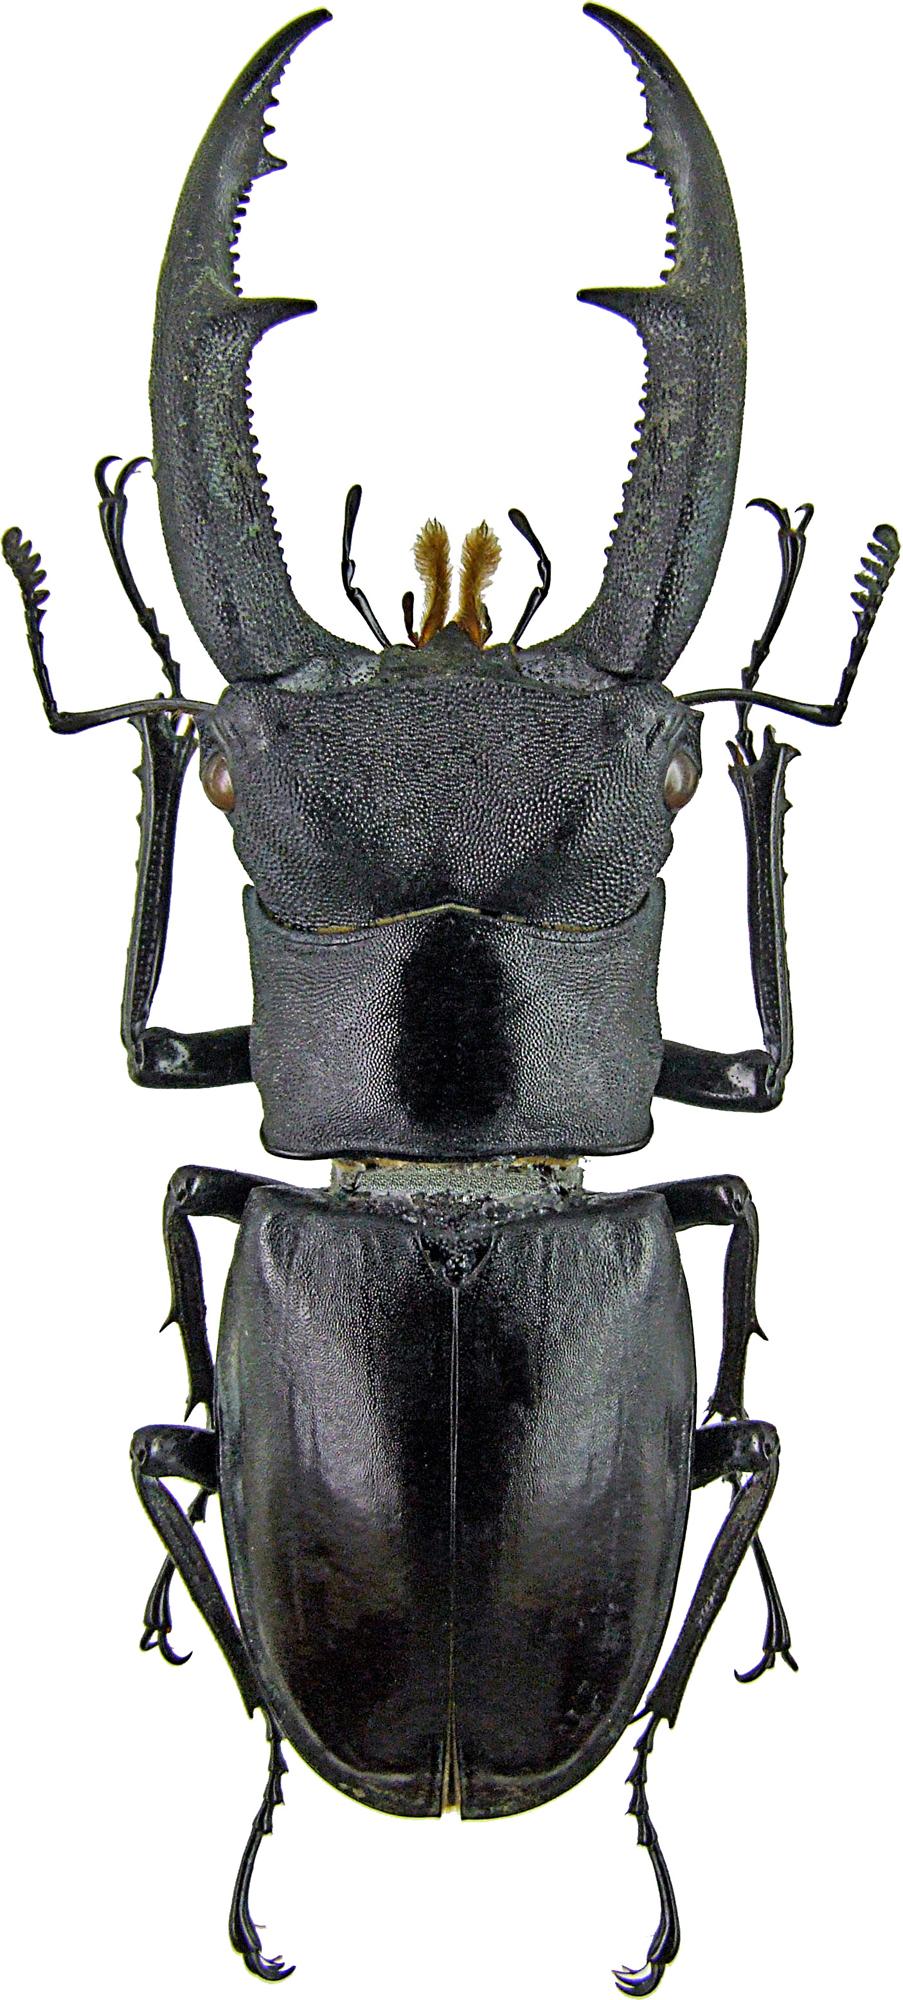 Hexarthrius mandibularis 1304.jpg